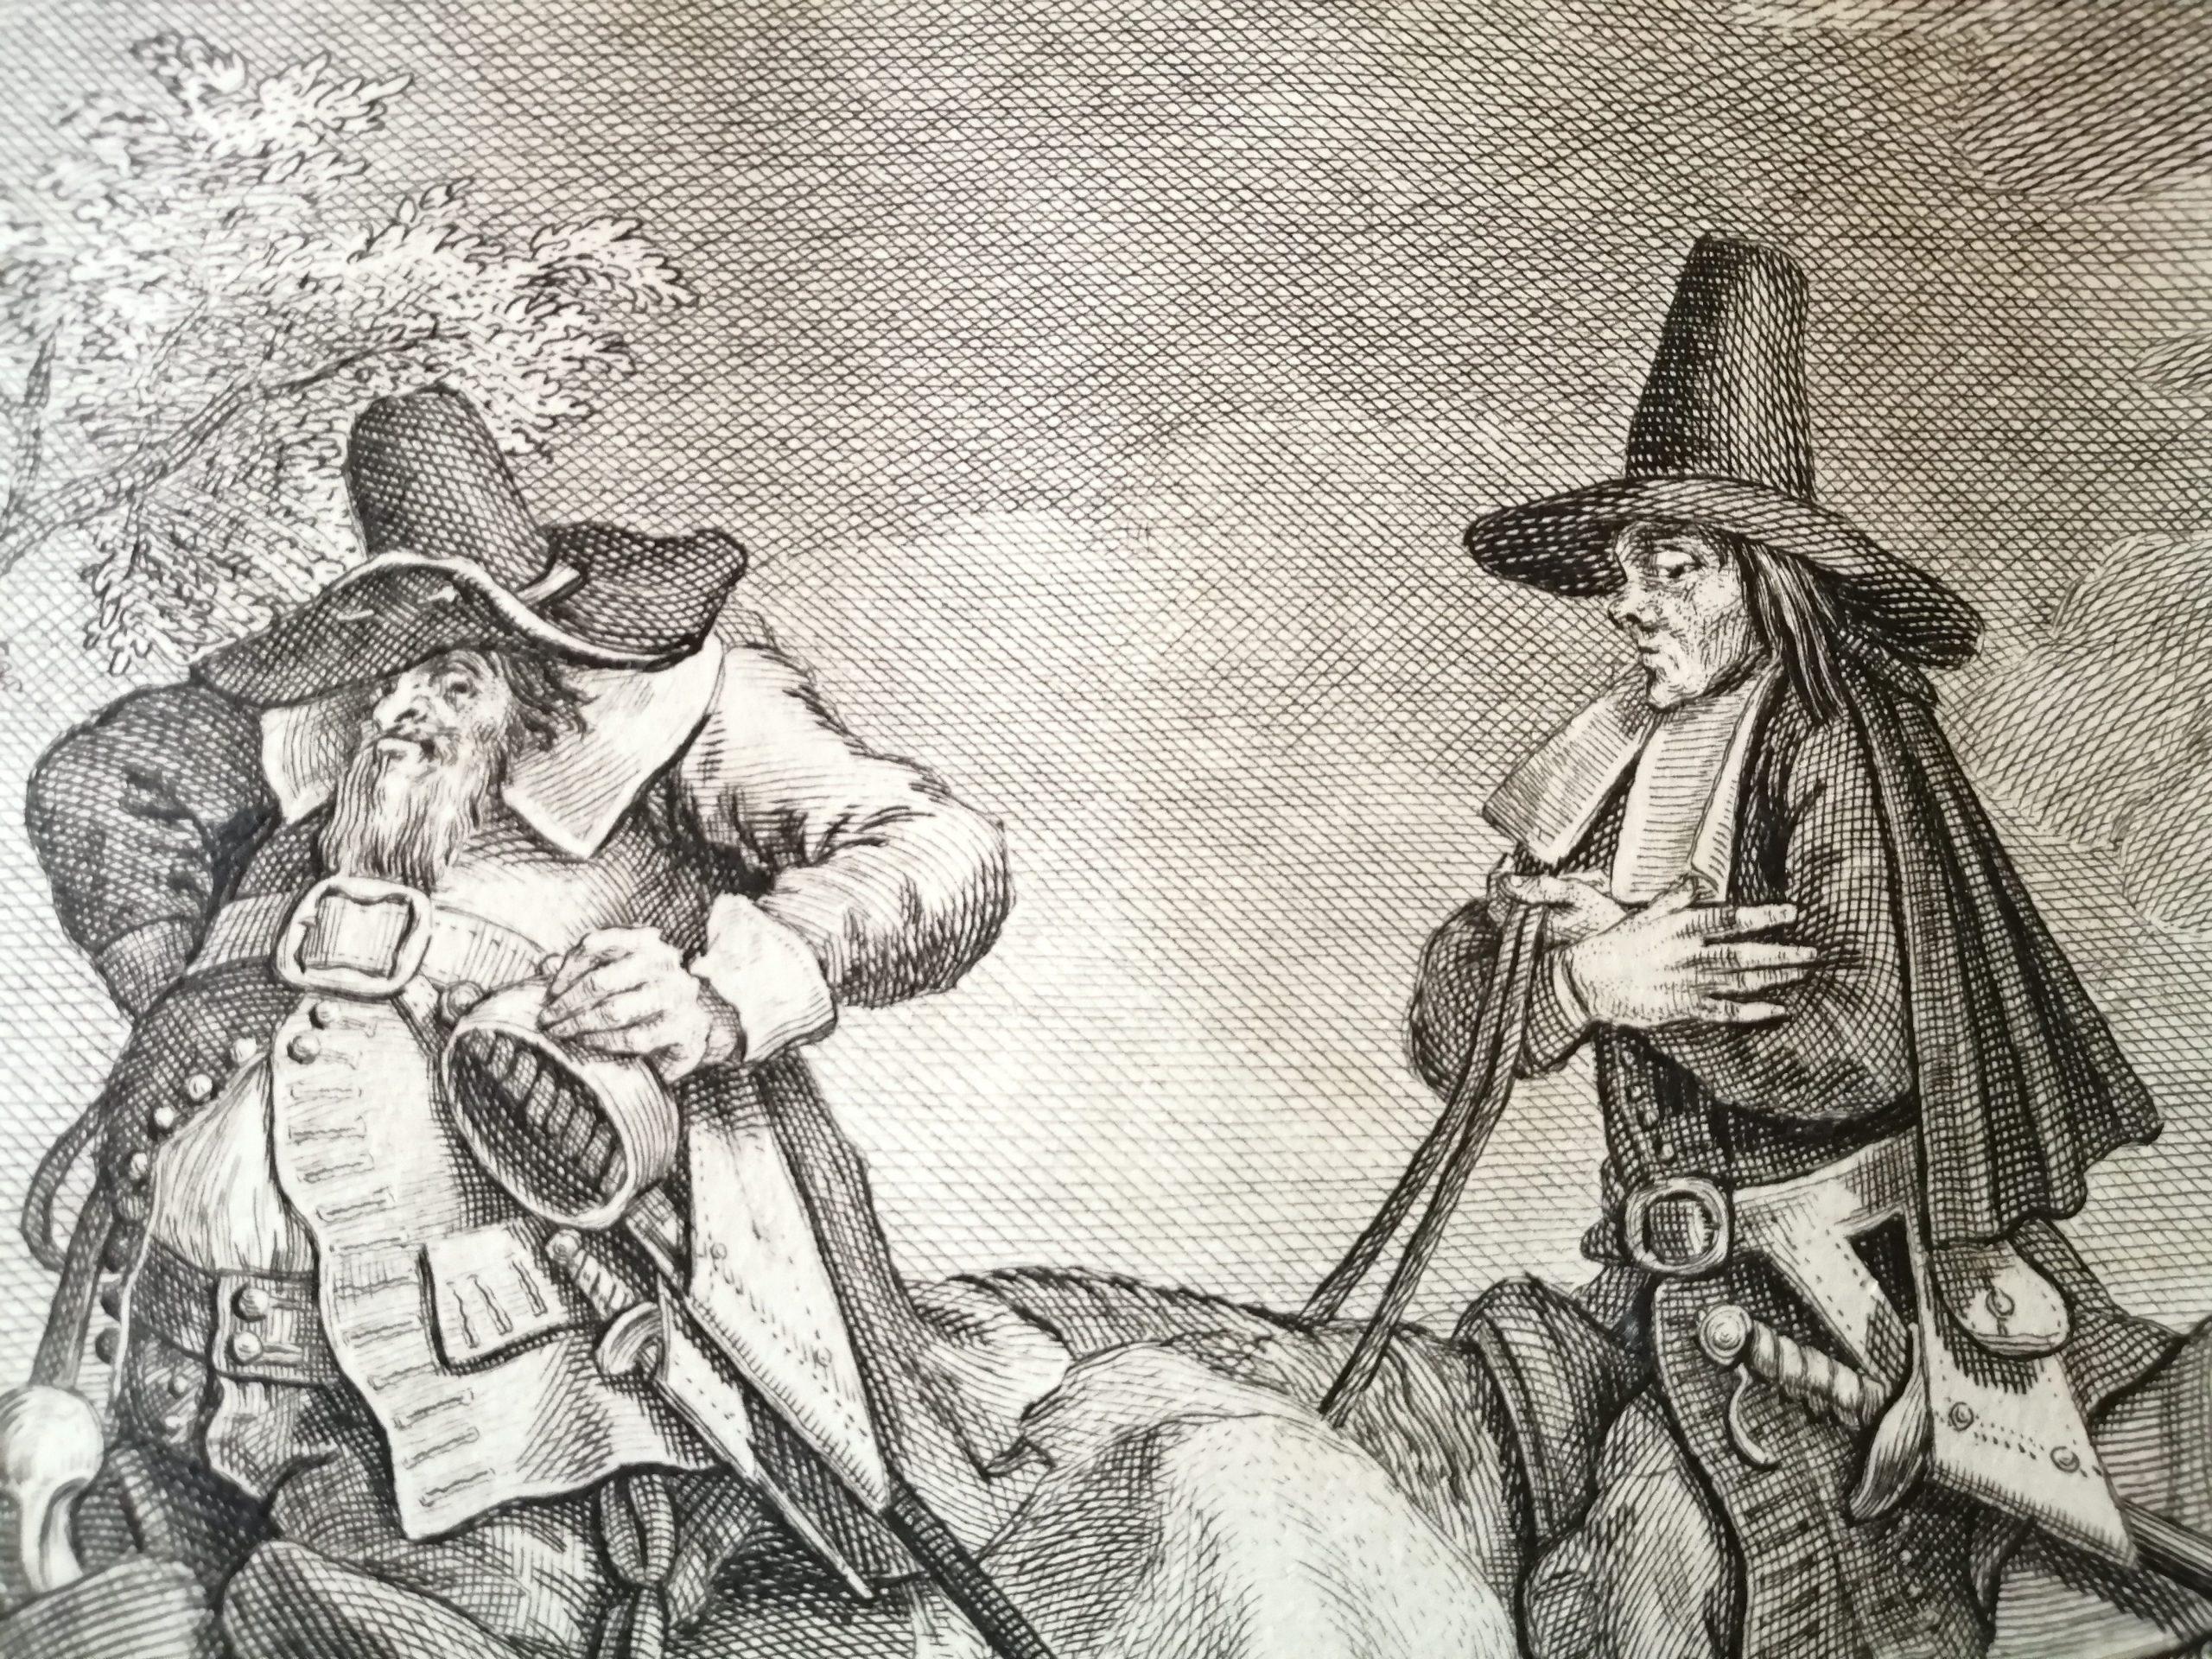 HOGARTH, W. Les Satyres de M. Guillaume Hogarth, 1768